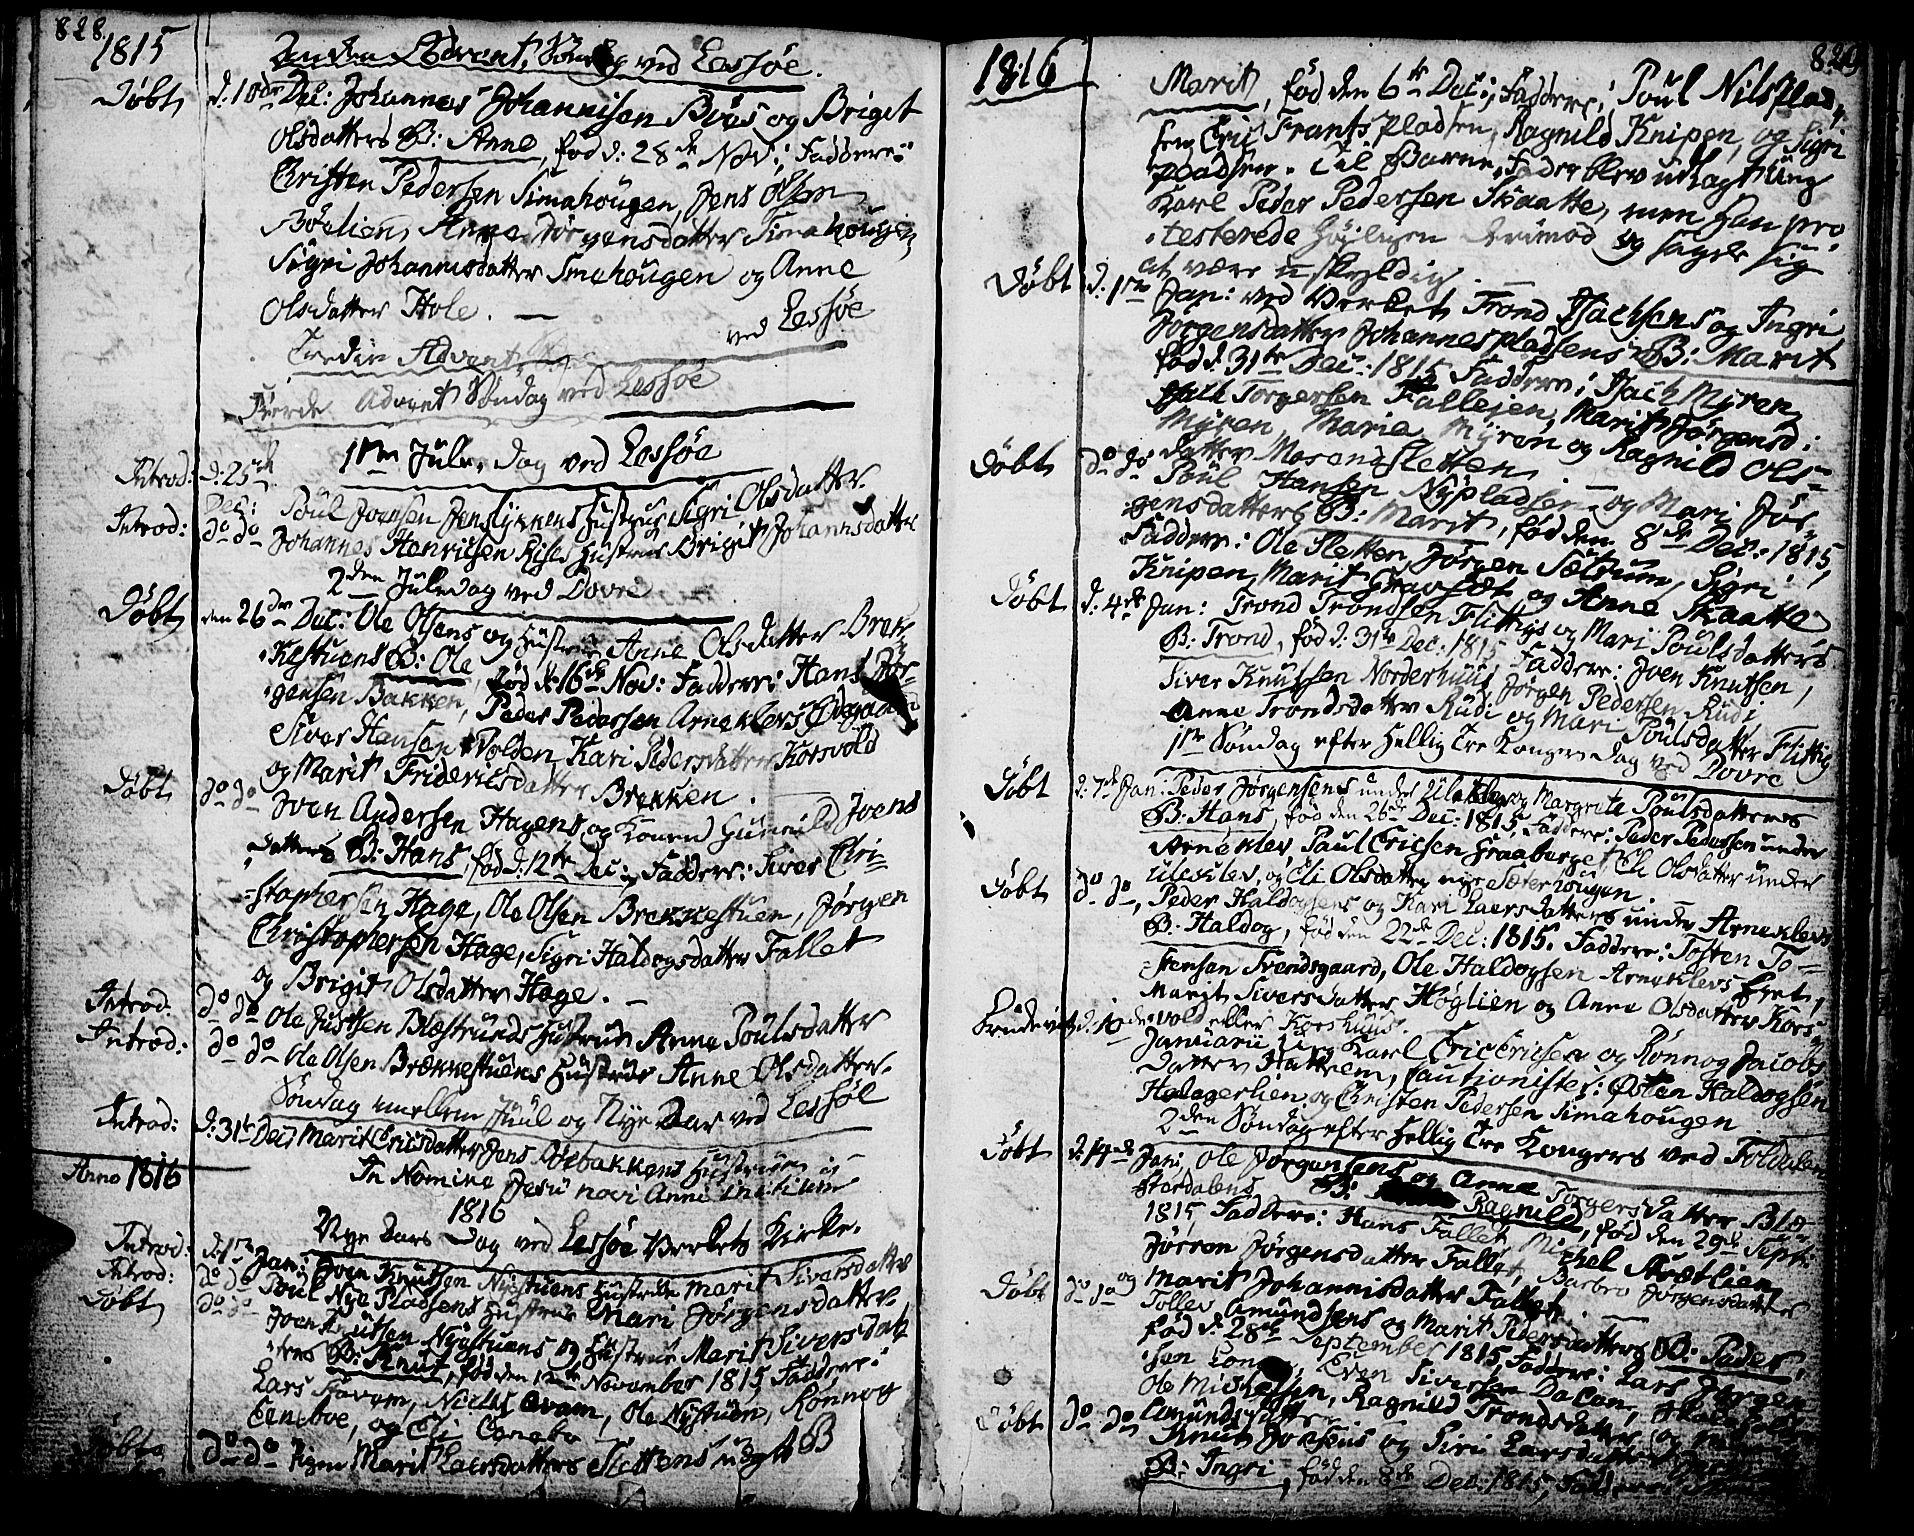 SAH, Lesja prestekontor, Ministerialbok nr. 3, 1777-1819, s. 828-829